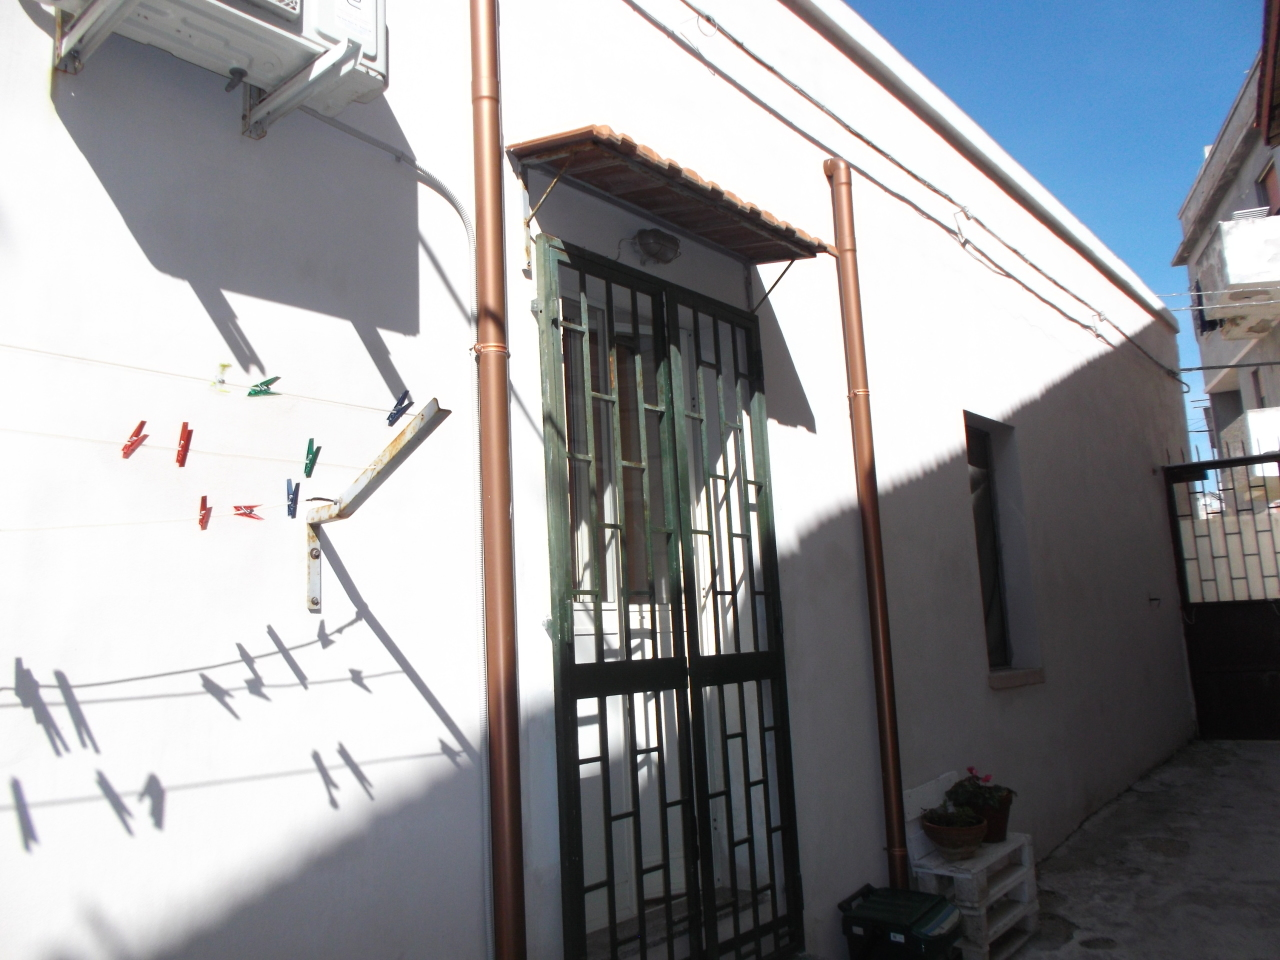 siracusa vendita quart: adda gelone santuario timoleonte schiavone immobiliare